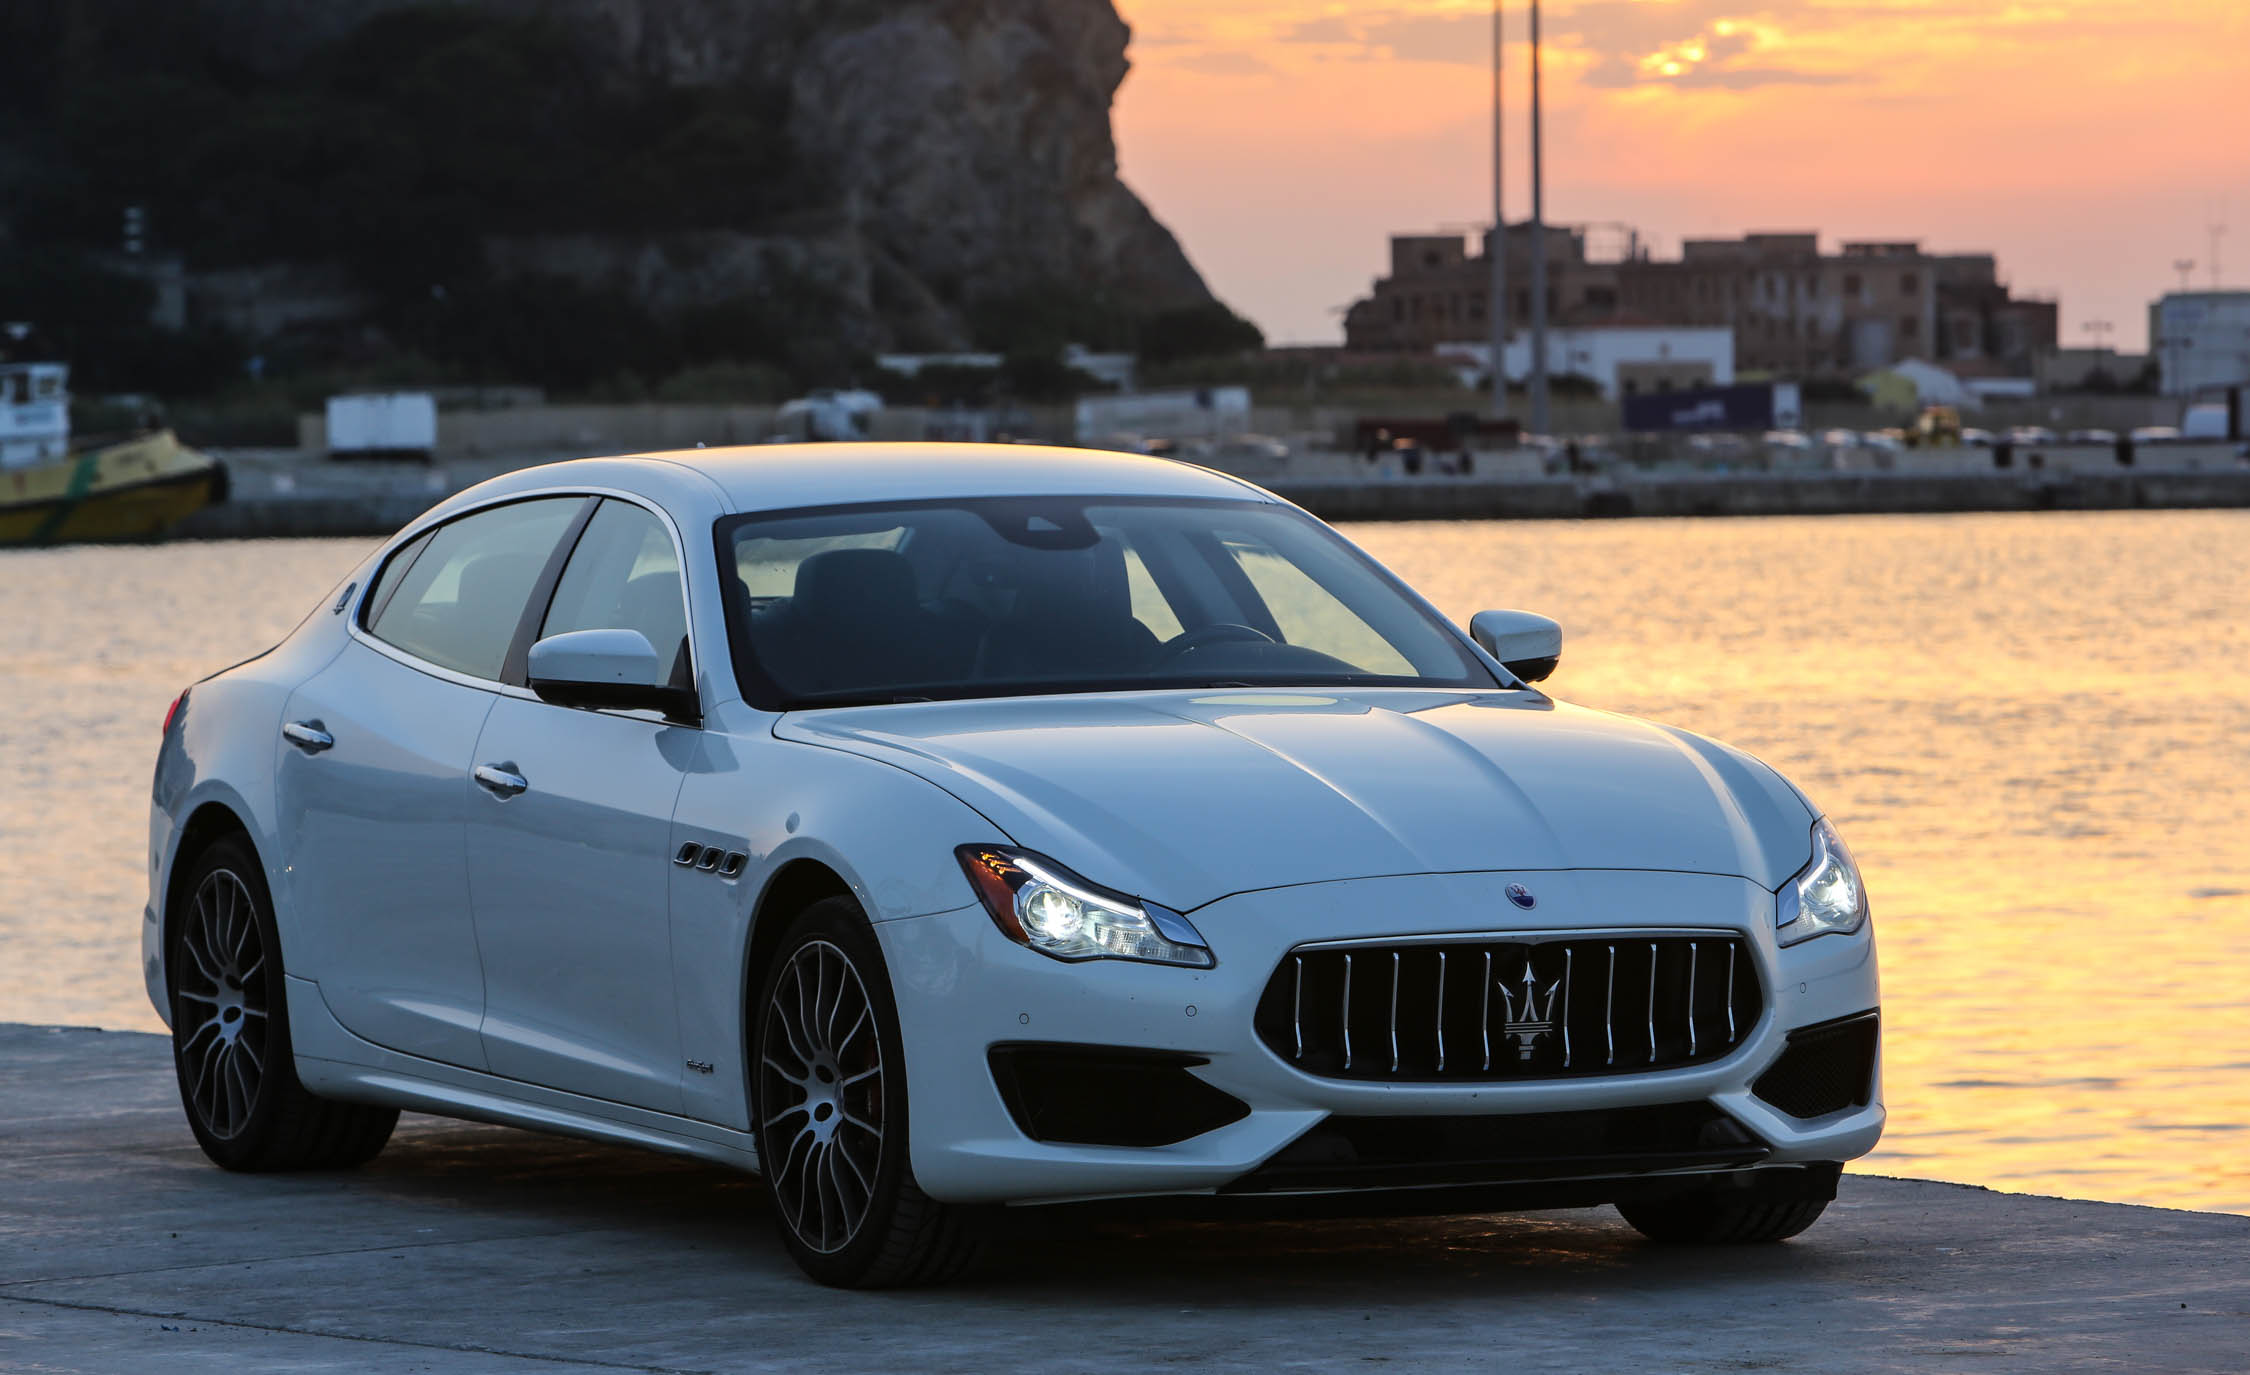 2017 Maserati Quattroporte GTS GranSport (View 46 of 55)